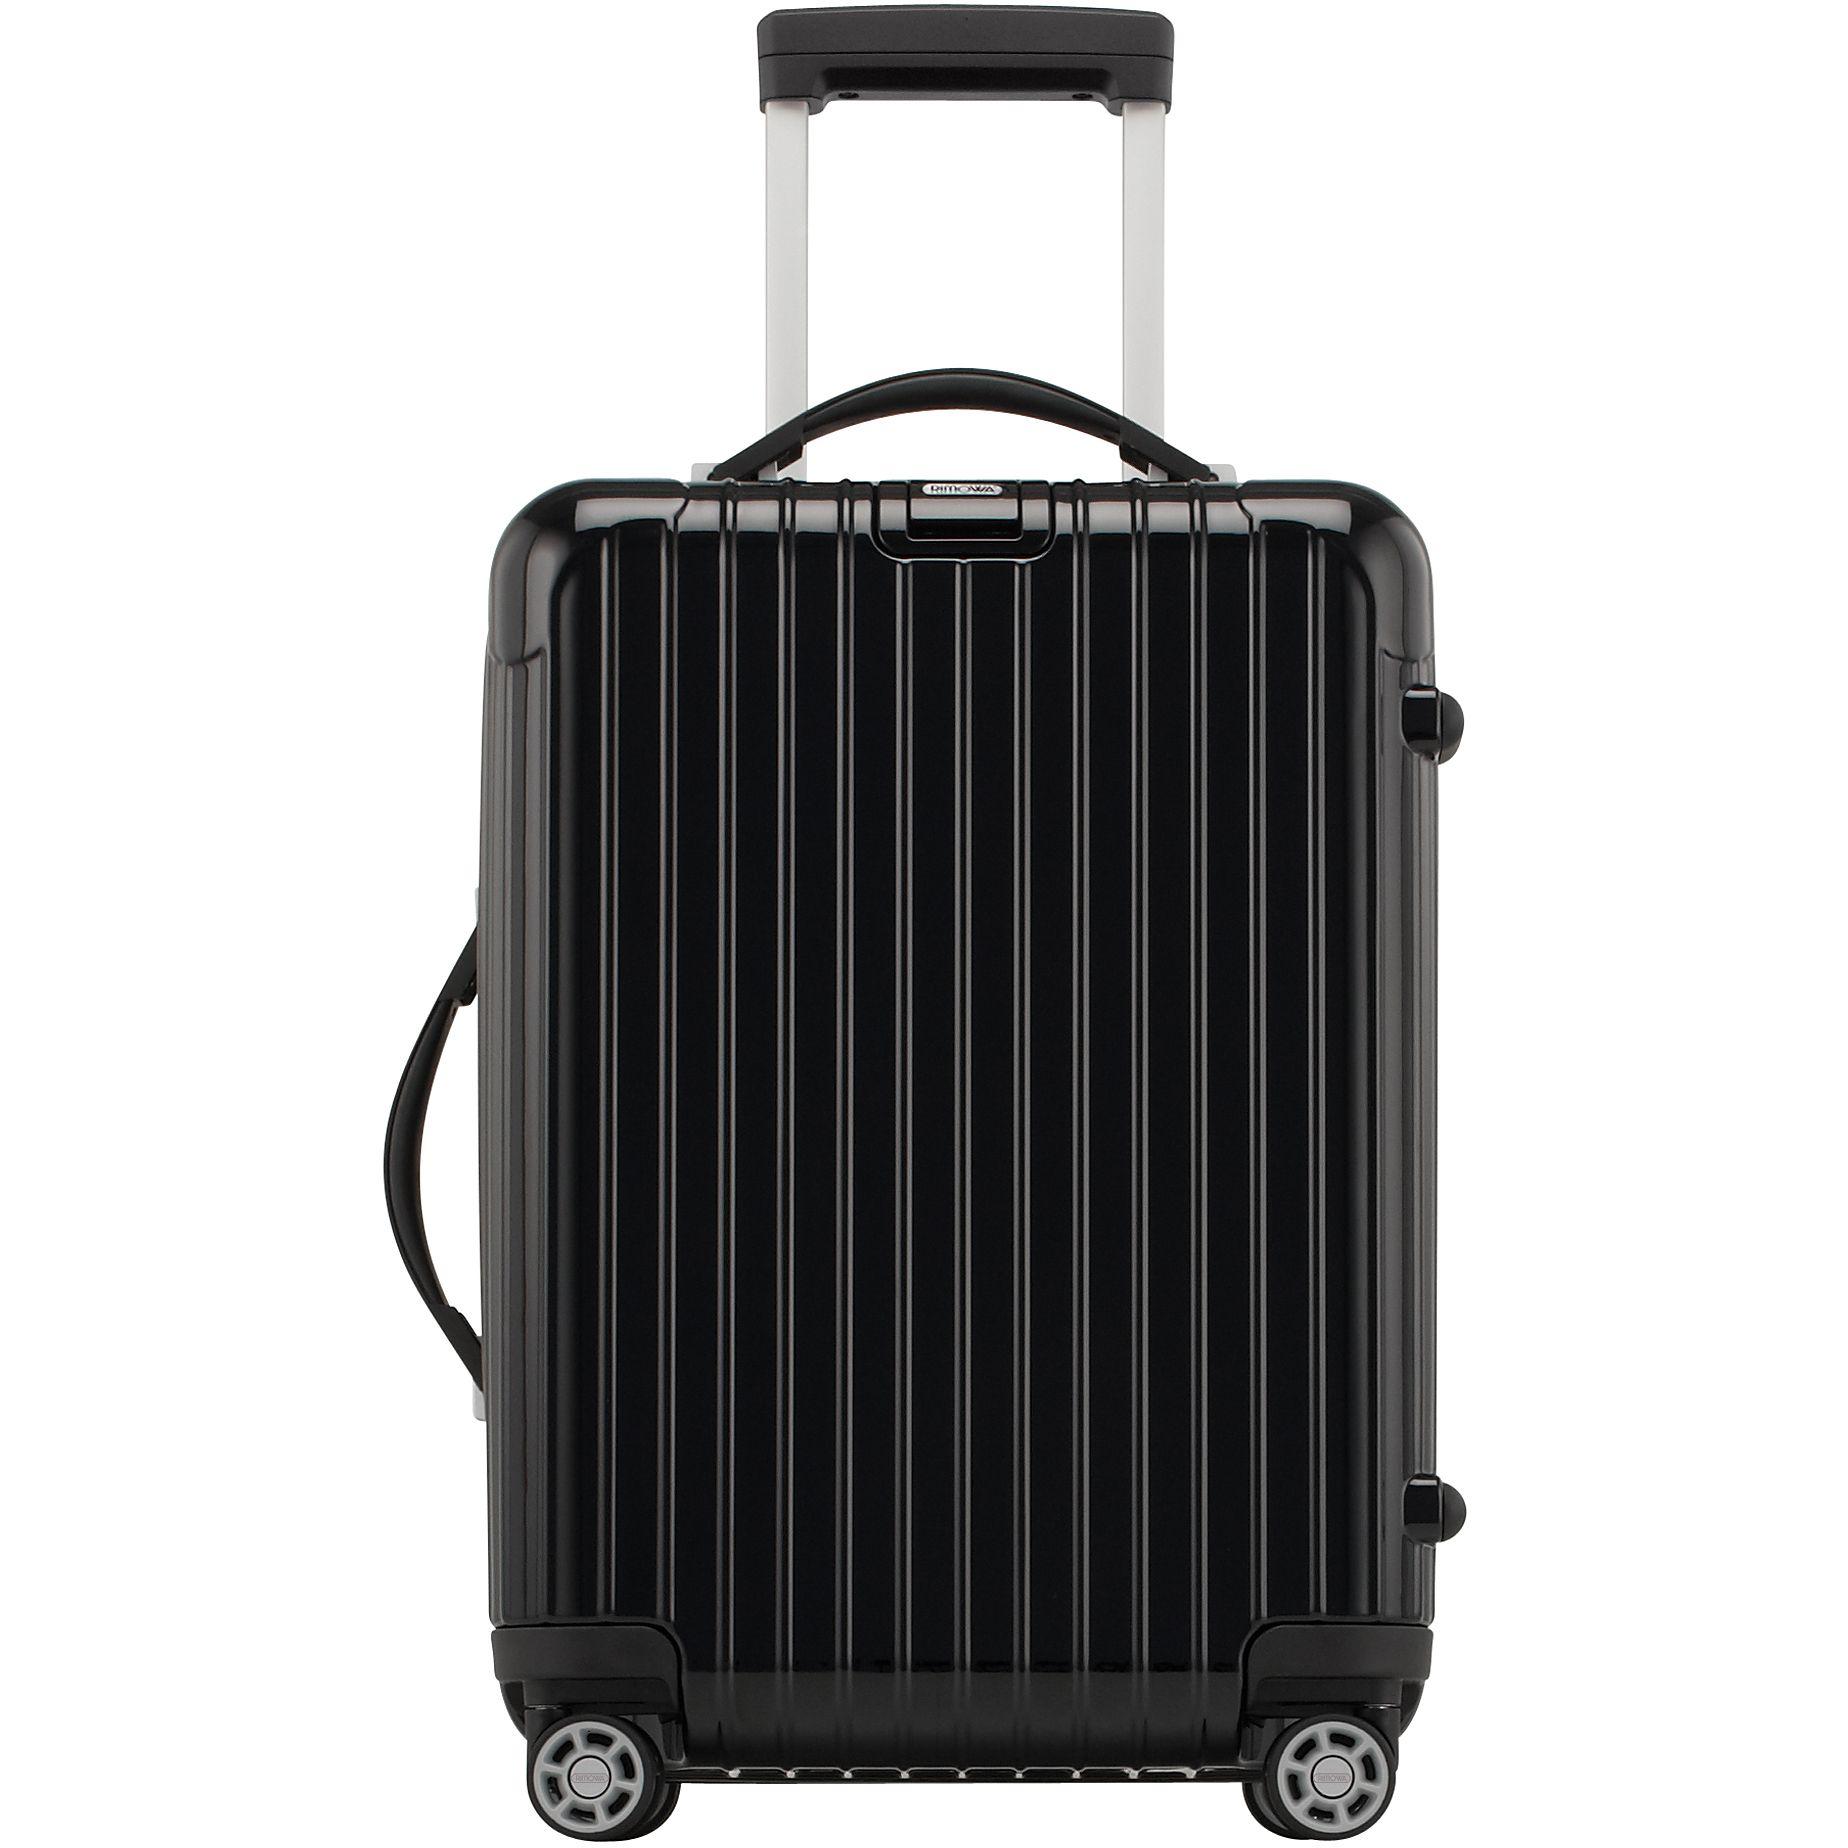 rimowa salsa deluxe cabin multiwheel trolley 53 kaufen bei markenkoffer. Black Bedroom Furniture Sets. Home Design Ideas